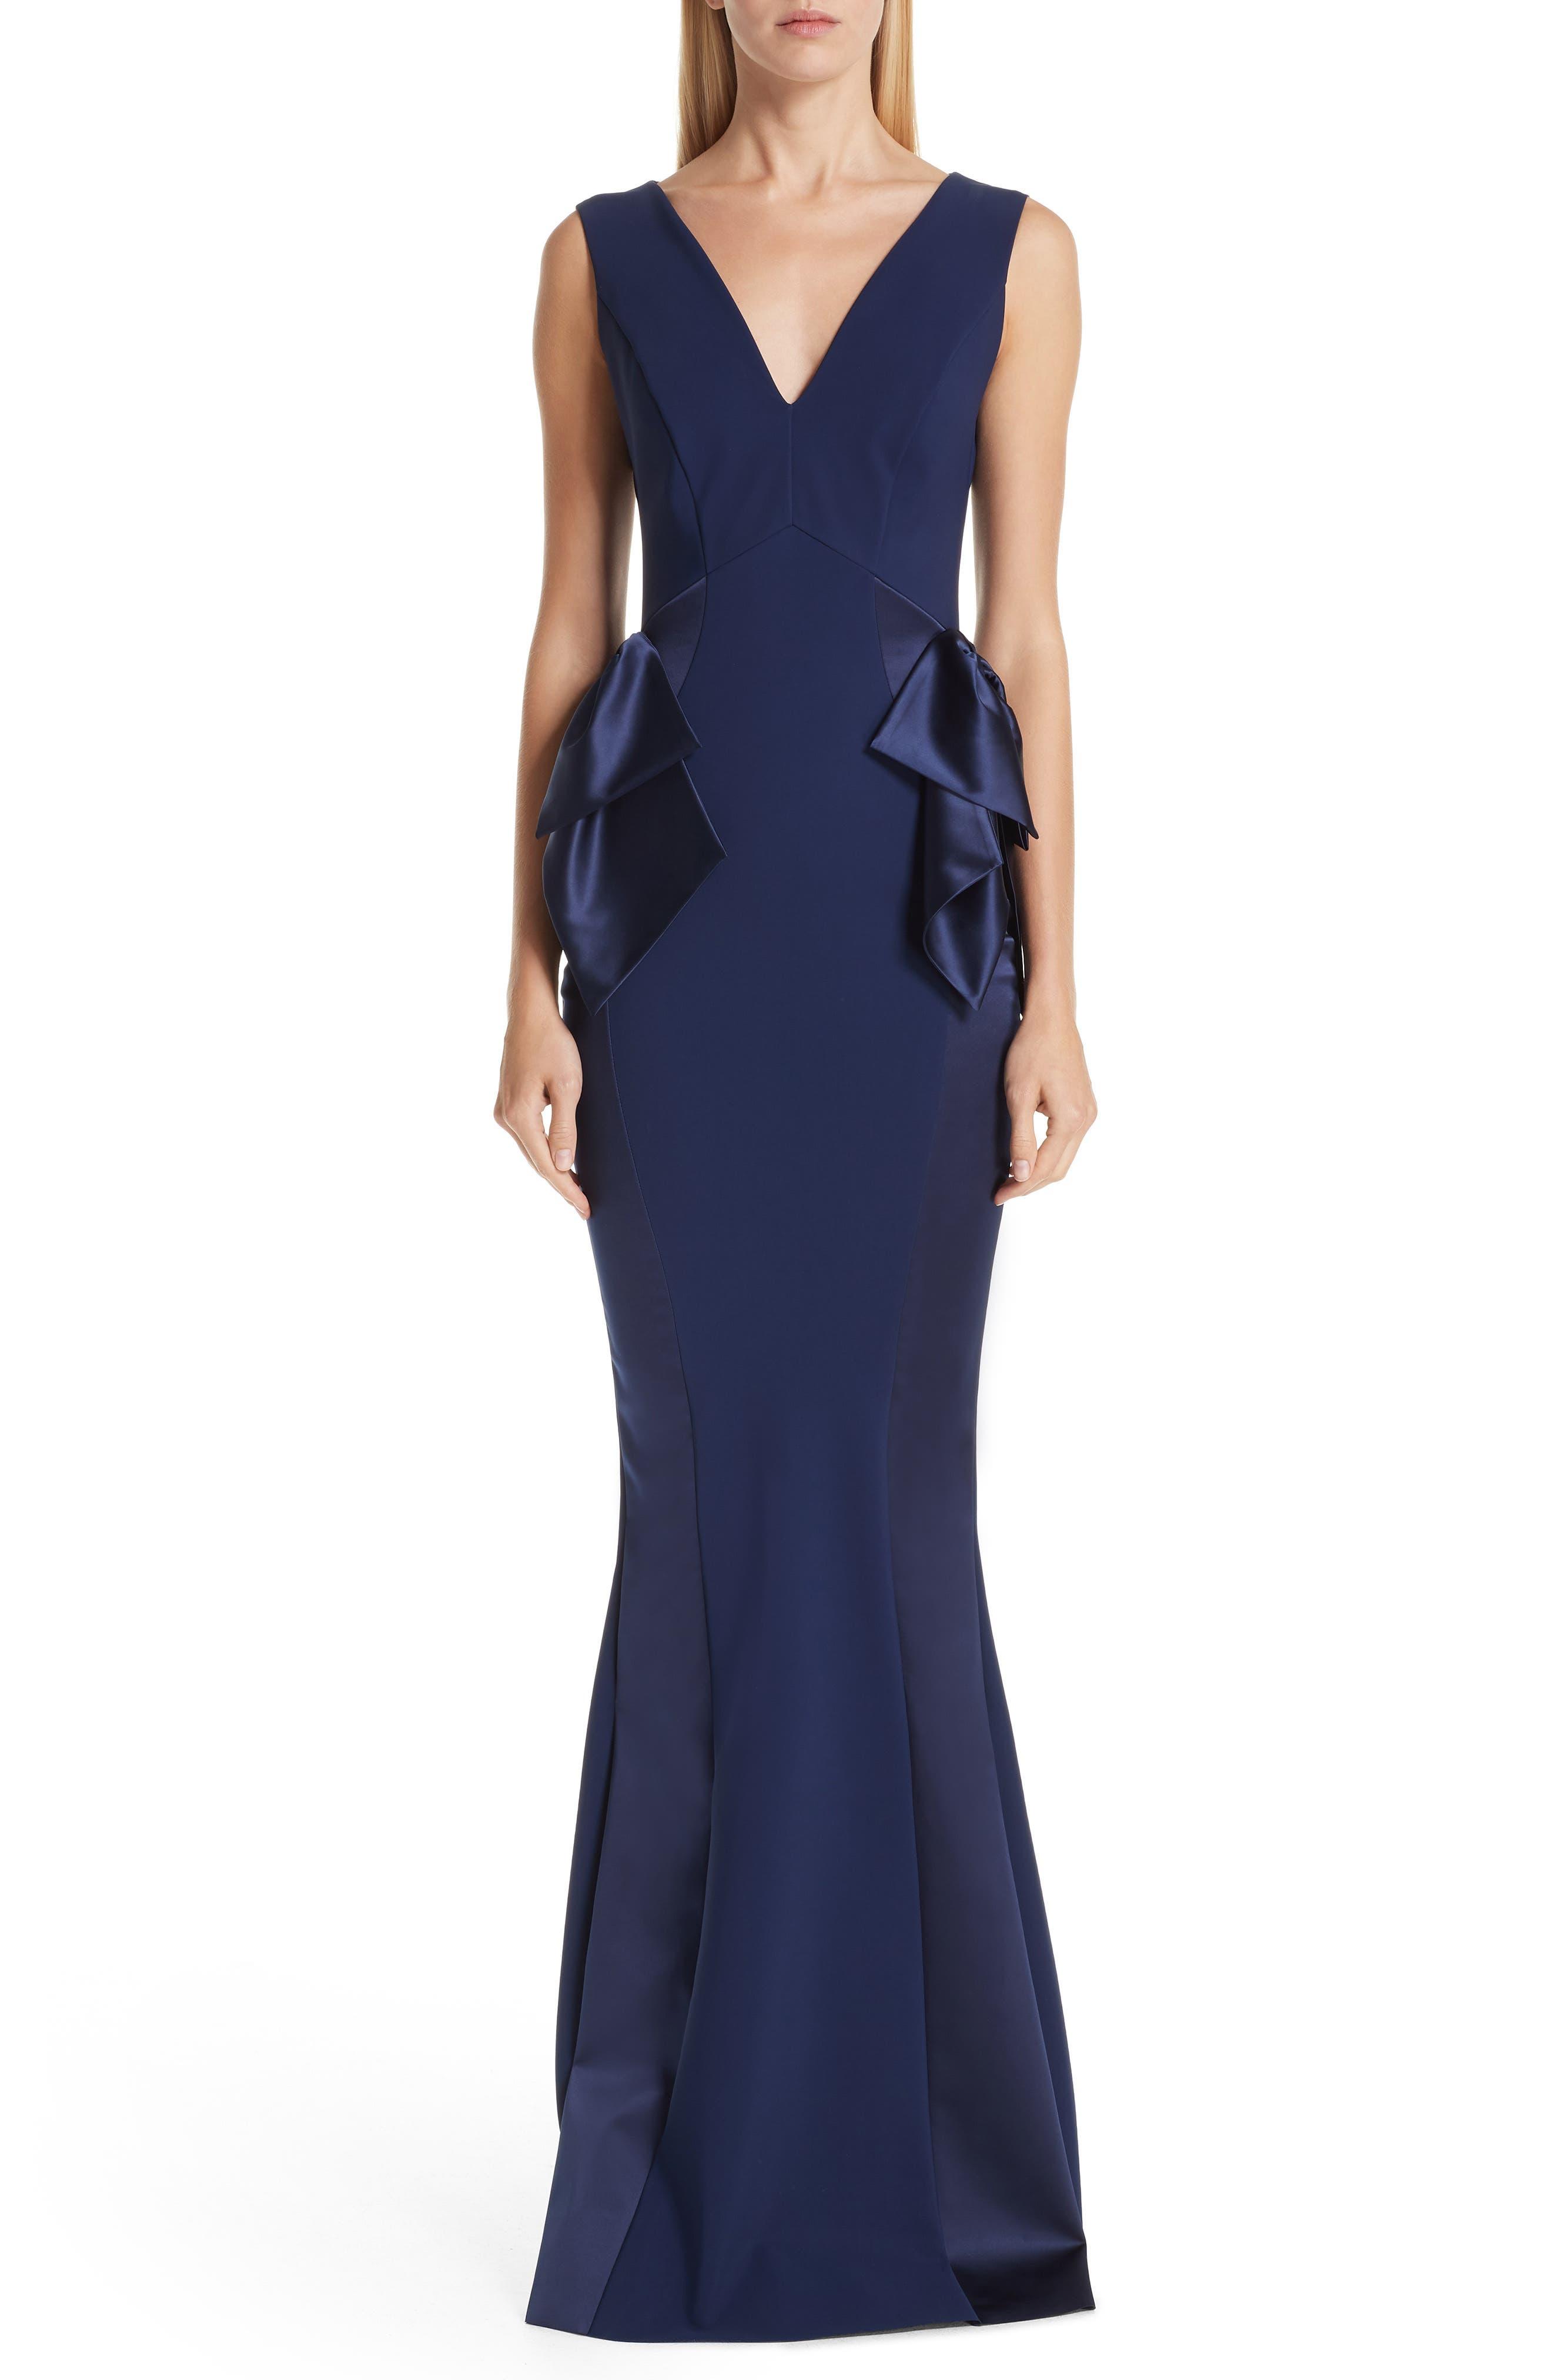 Chiara Boni La Petite Robe Macaria Satin Bow Trumpet Gown, US / 44 IT - Blue